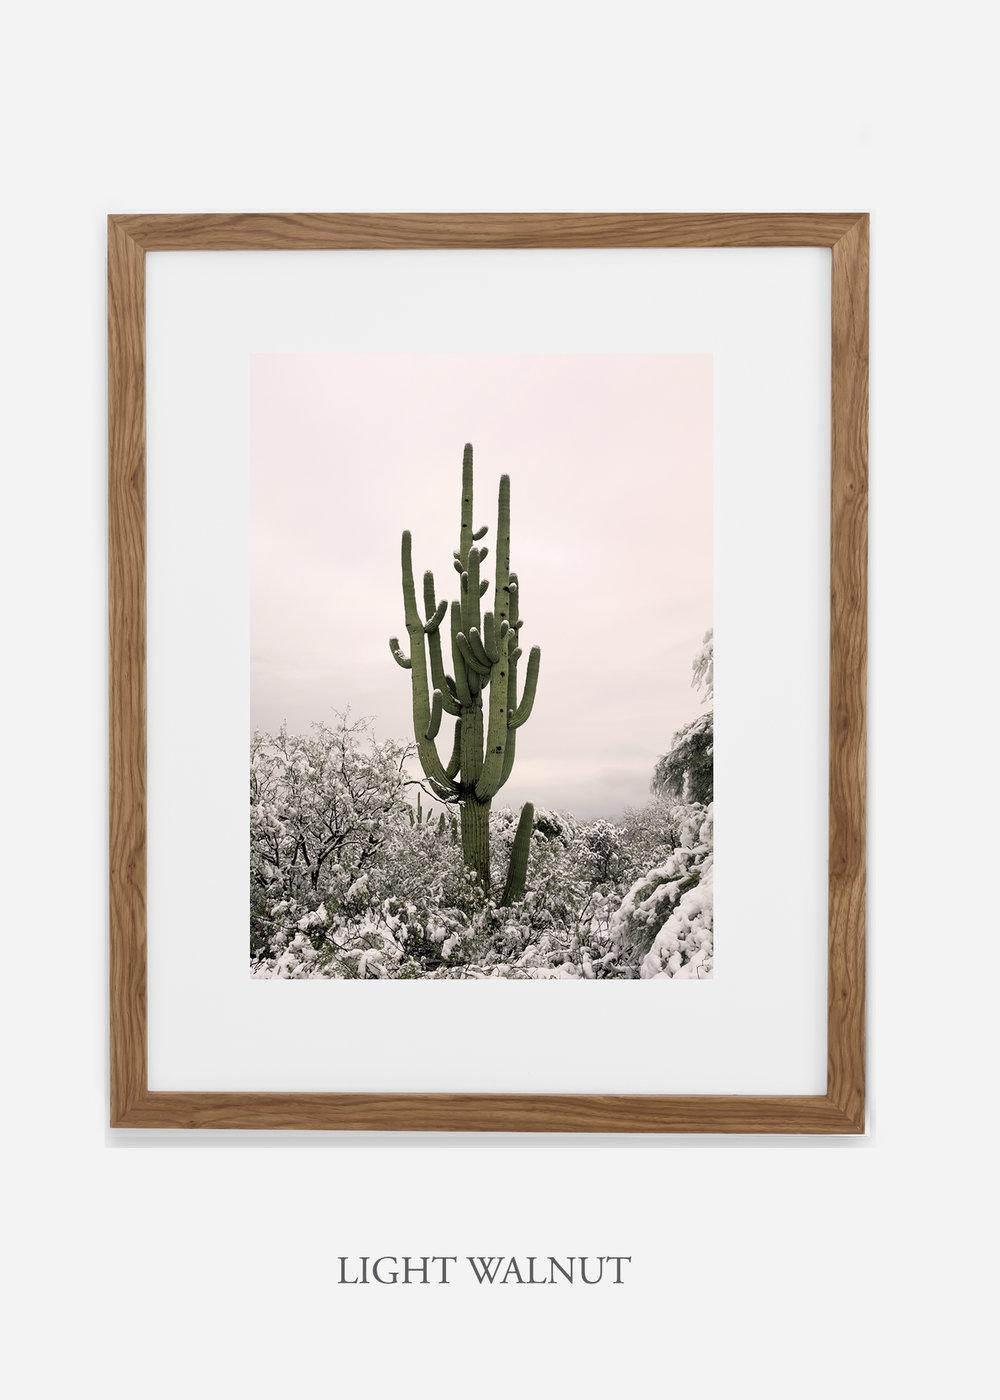 lightwalnutframe-saguaroNo.8-wildercalifornia-art-wallart-cactusprint-homedecor-prints-arizona-botanical-artwork-interiordesign.jpg